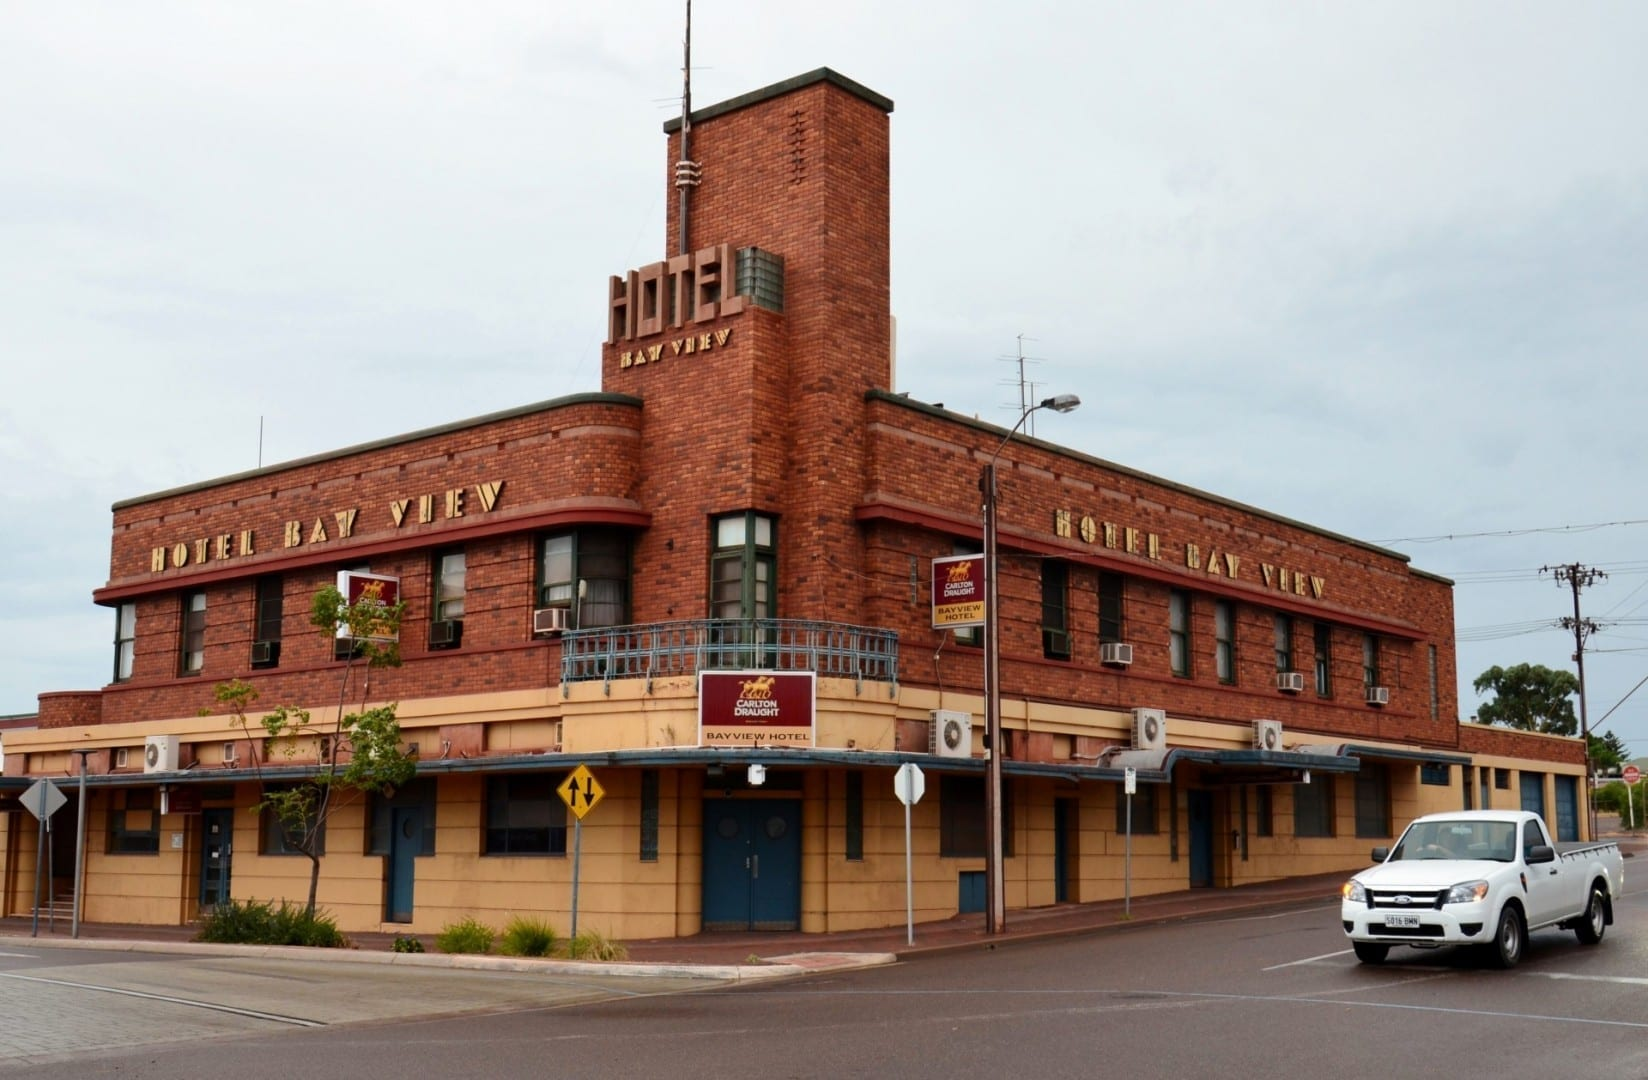 Hotel Bay View Whyalla Australia